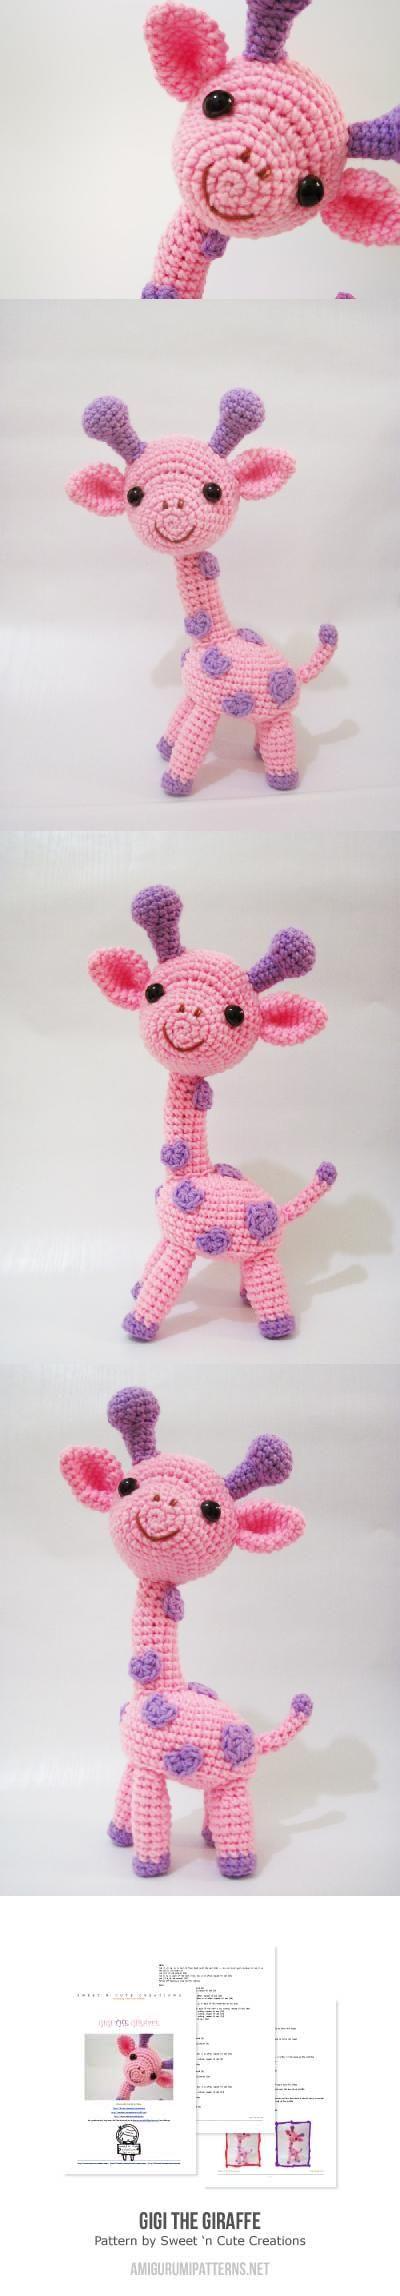 Gigi the Giraffe amigurumi pattern by Sweet N' Cute Creations